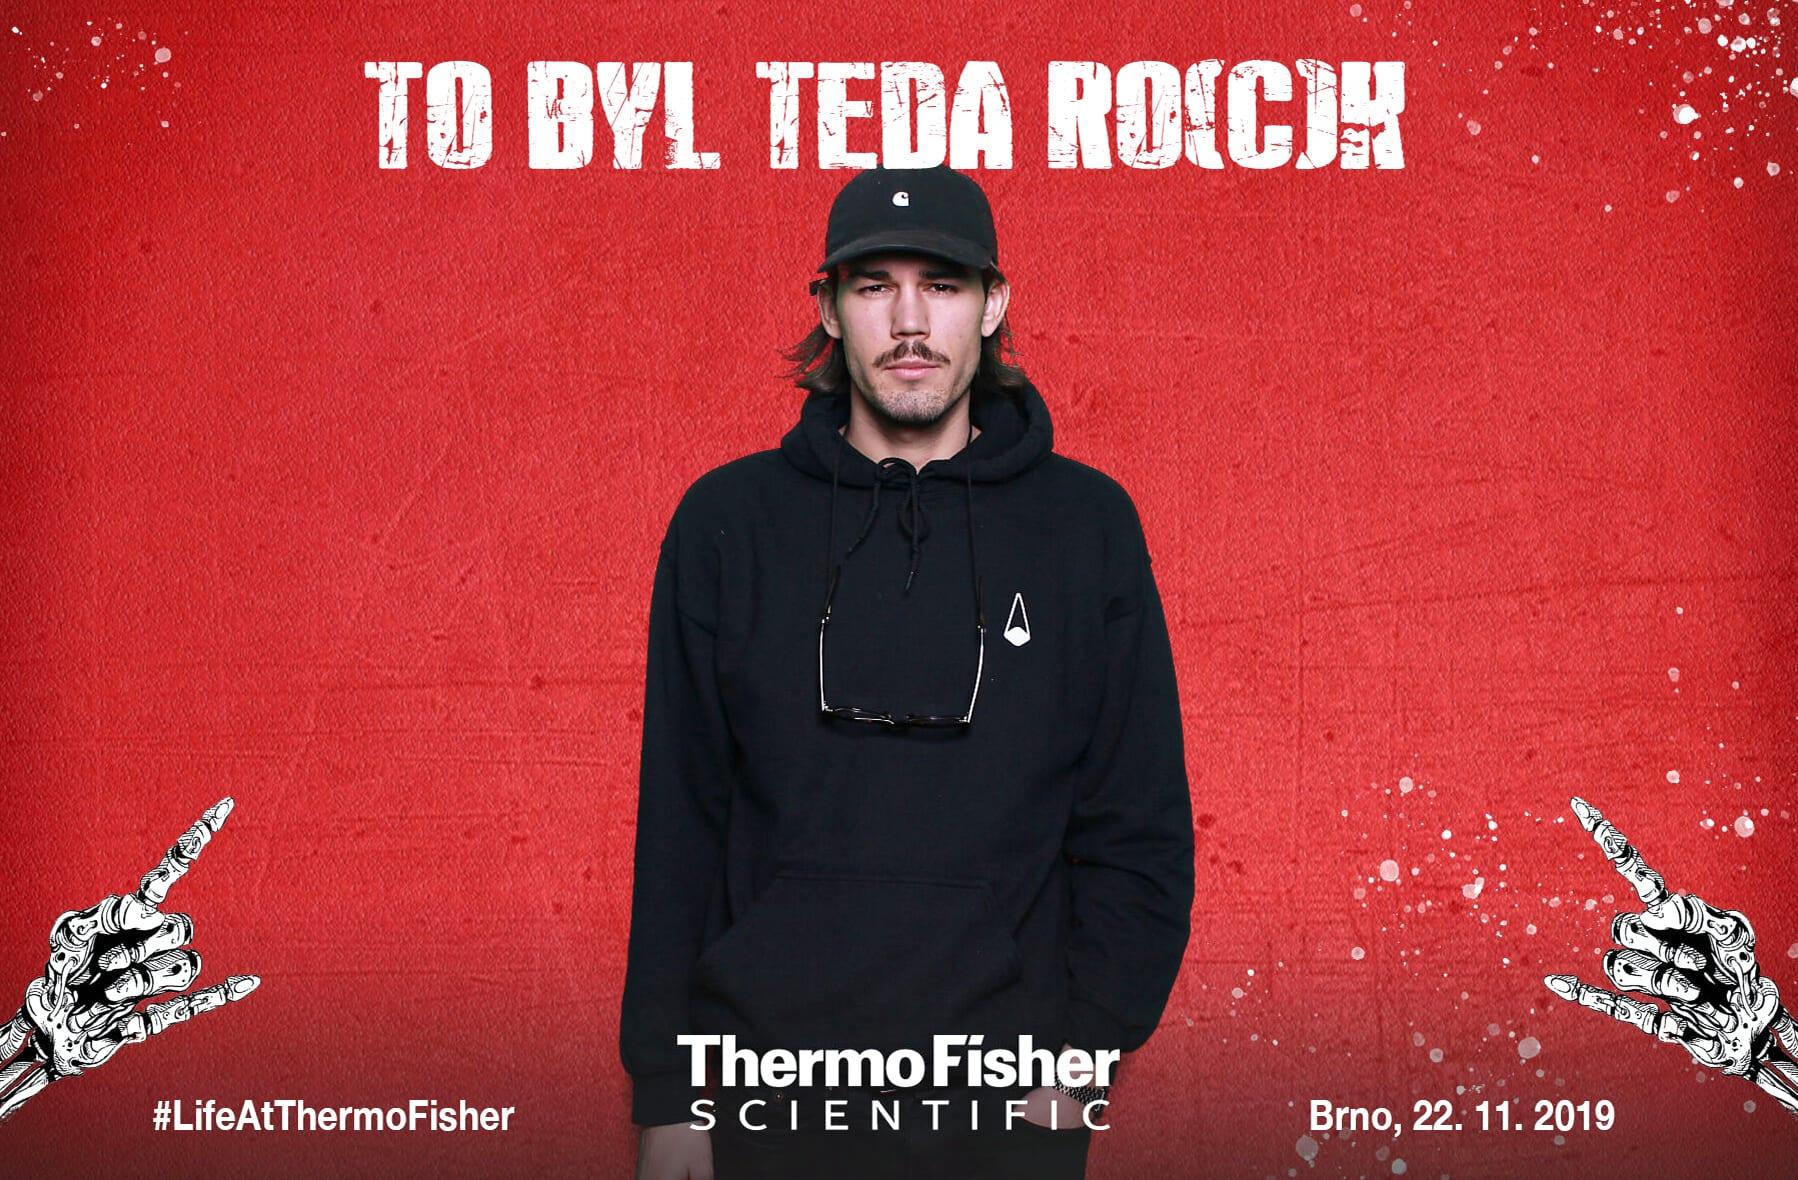 fotokoutek-brno-firemni-vecirek-thermo-fisher-22-11-2019-673791